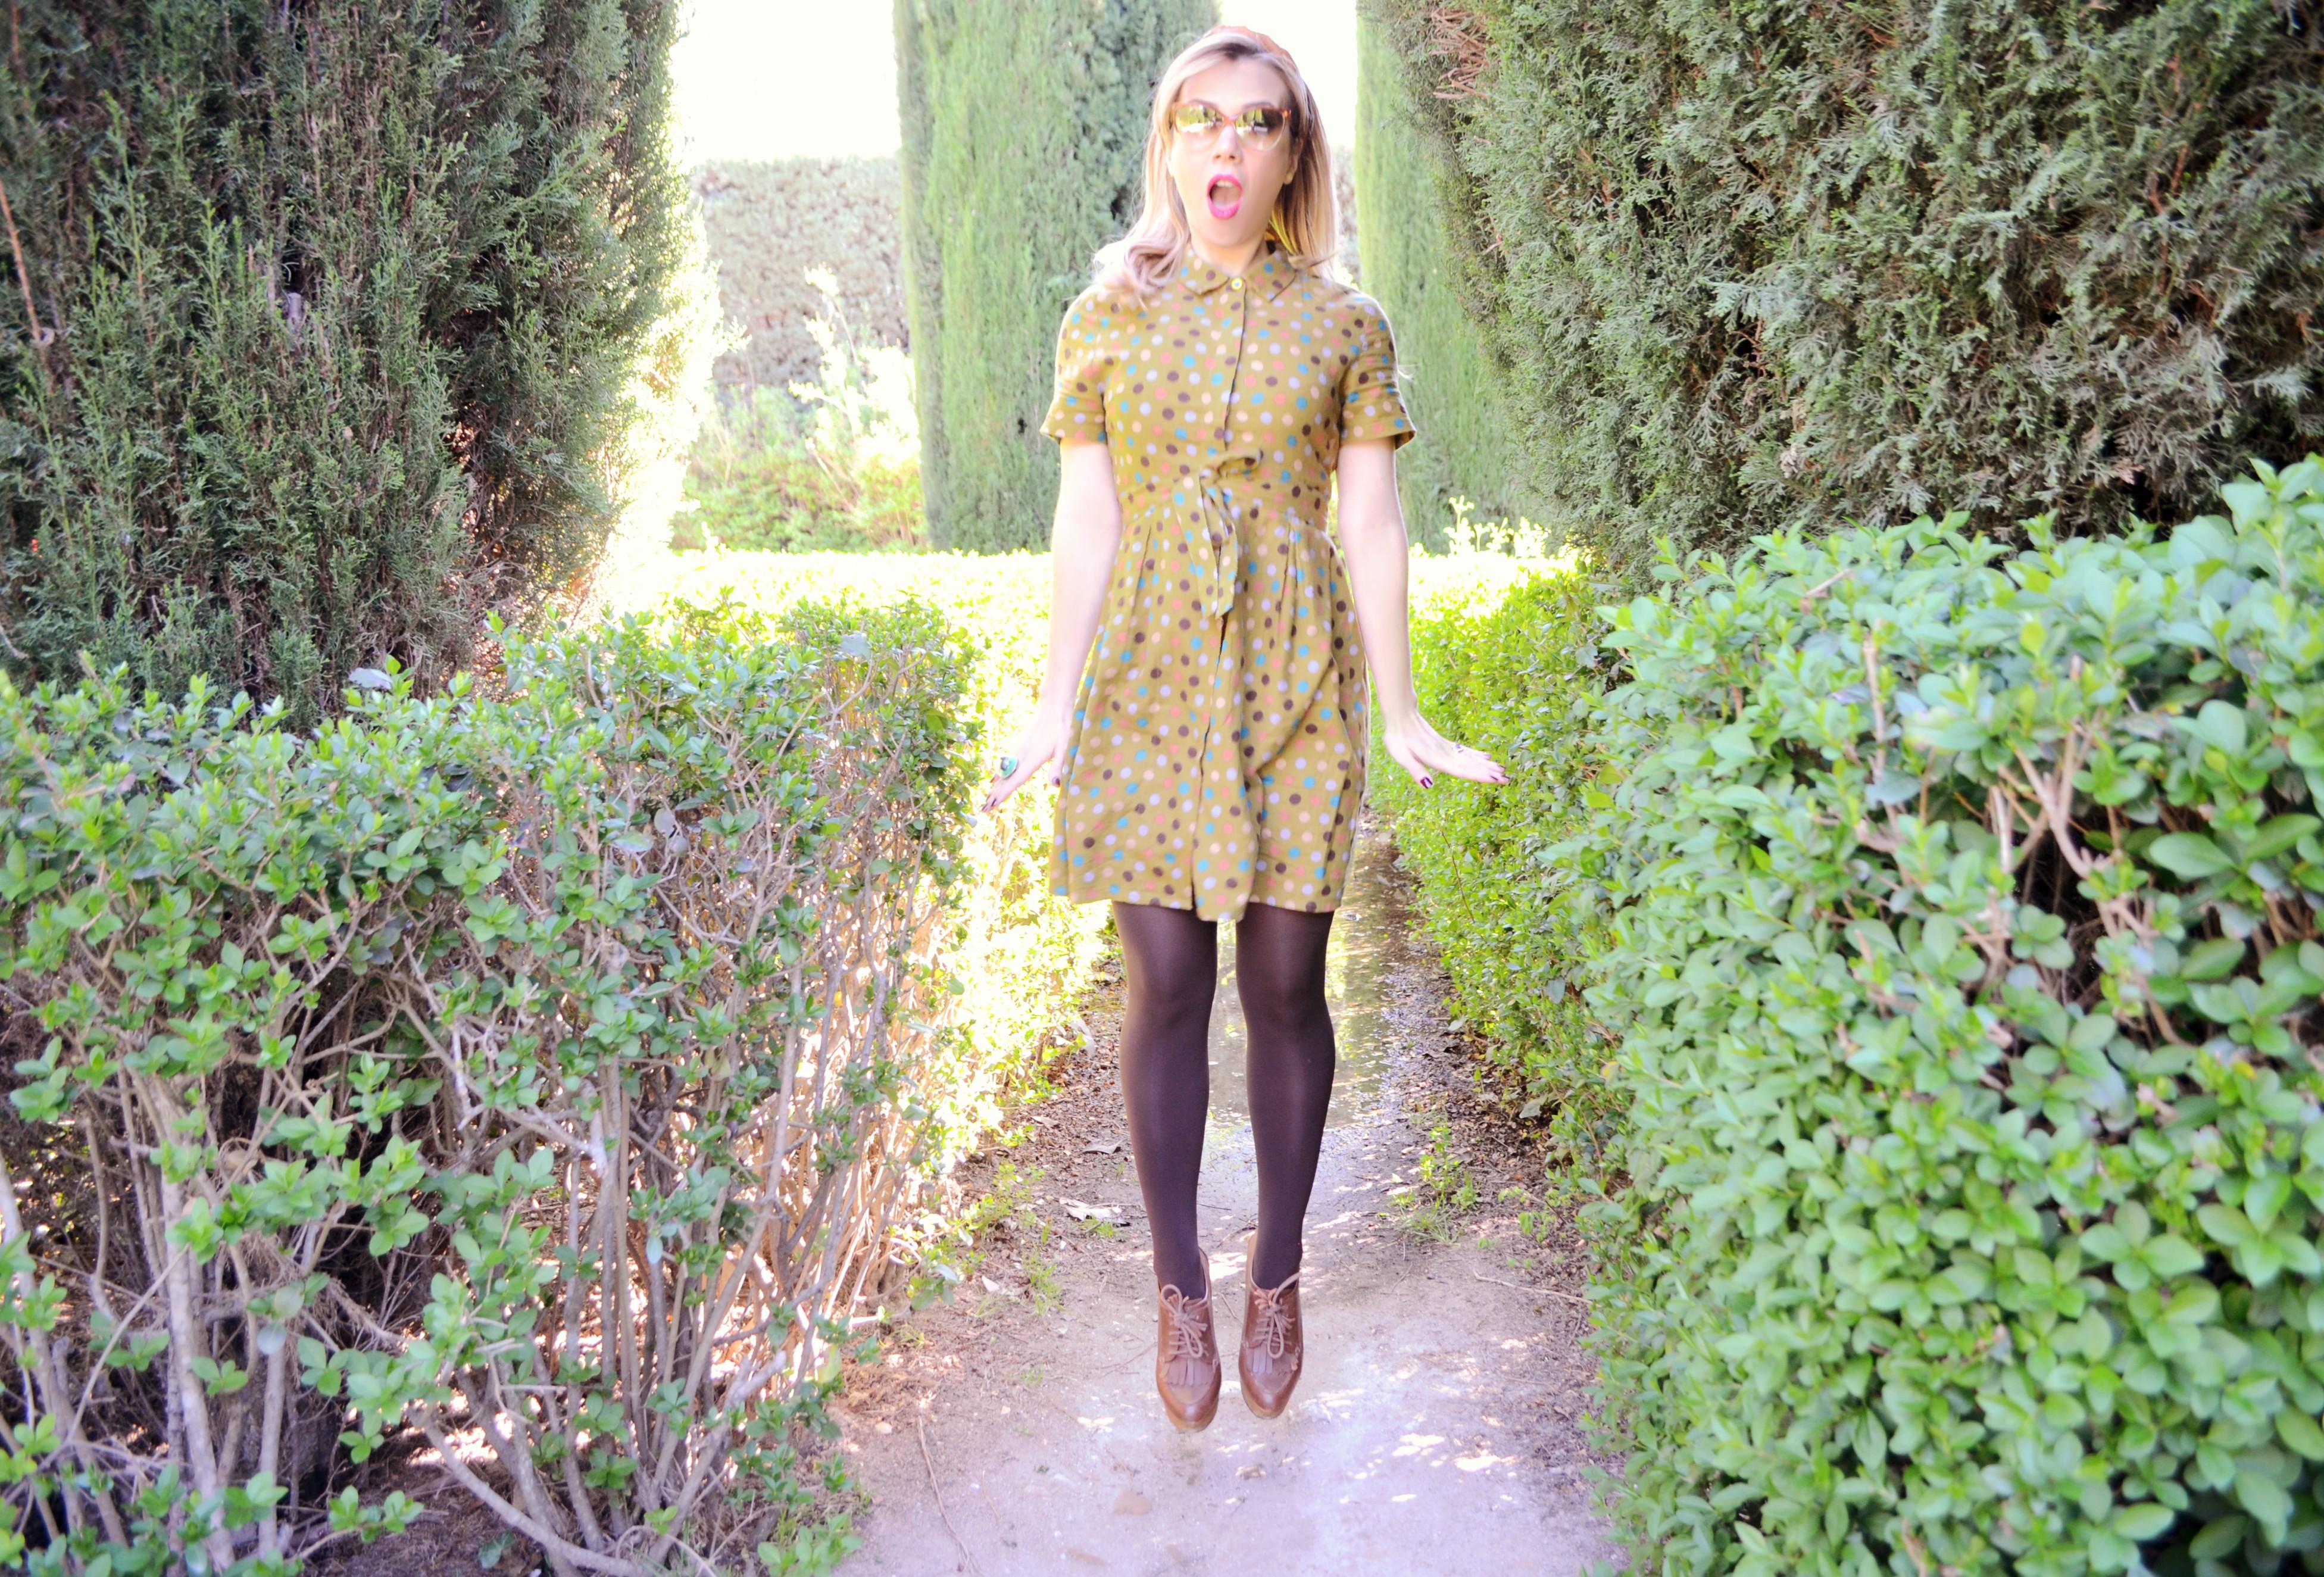 Vestido-de-lunares-blog-de-moda-ChicAdicta-fashionista-Chic-Adicta-influencer-Madrid-street-style-retro-outfit-PiensaenChic-Piensa-en-Chic